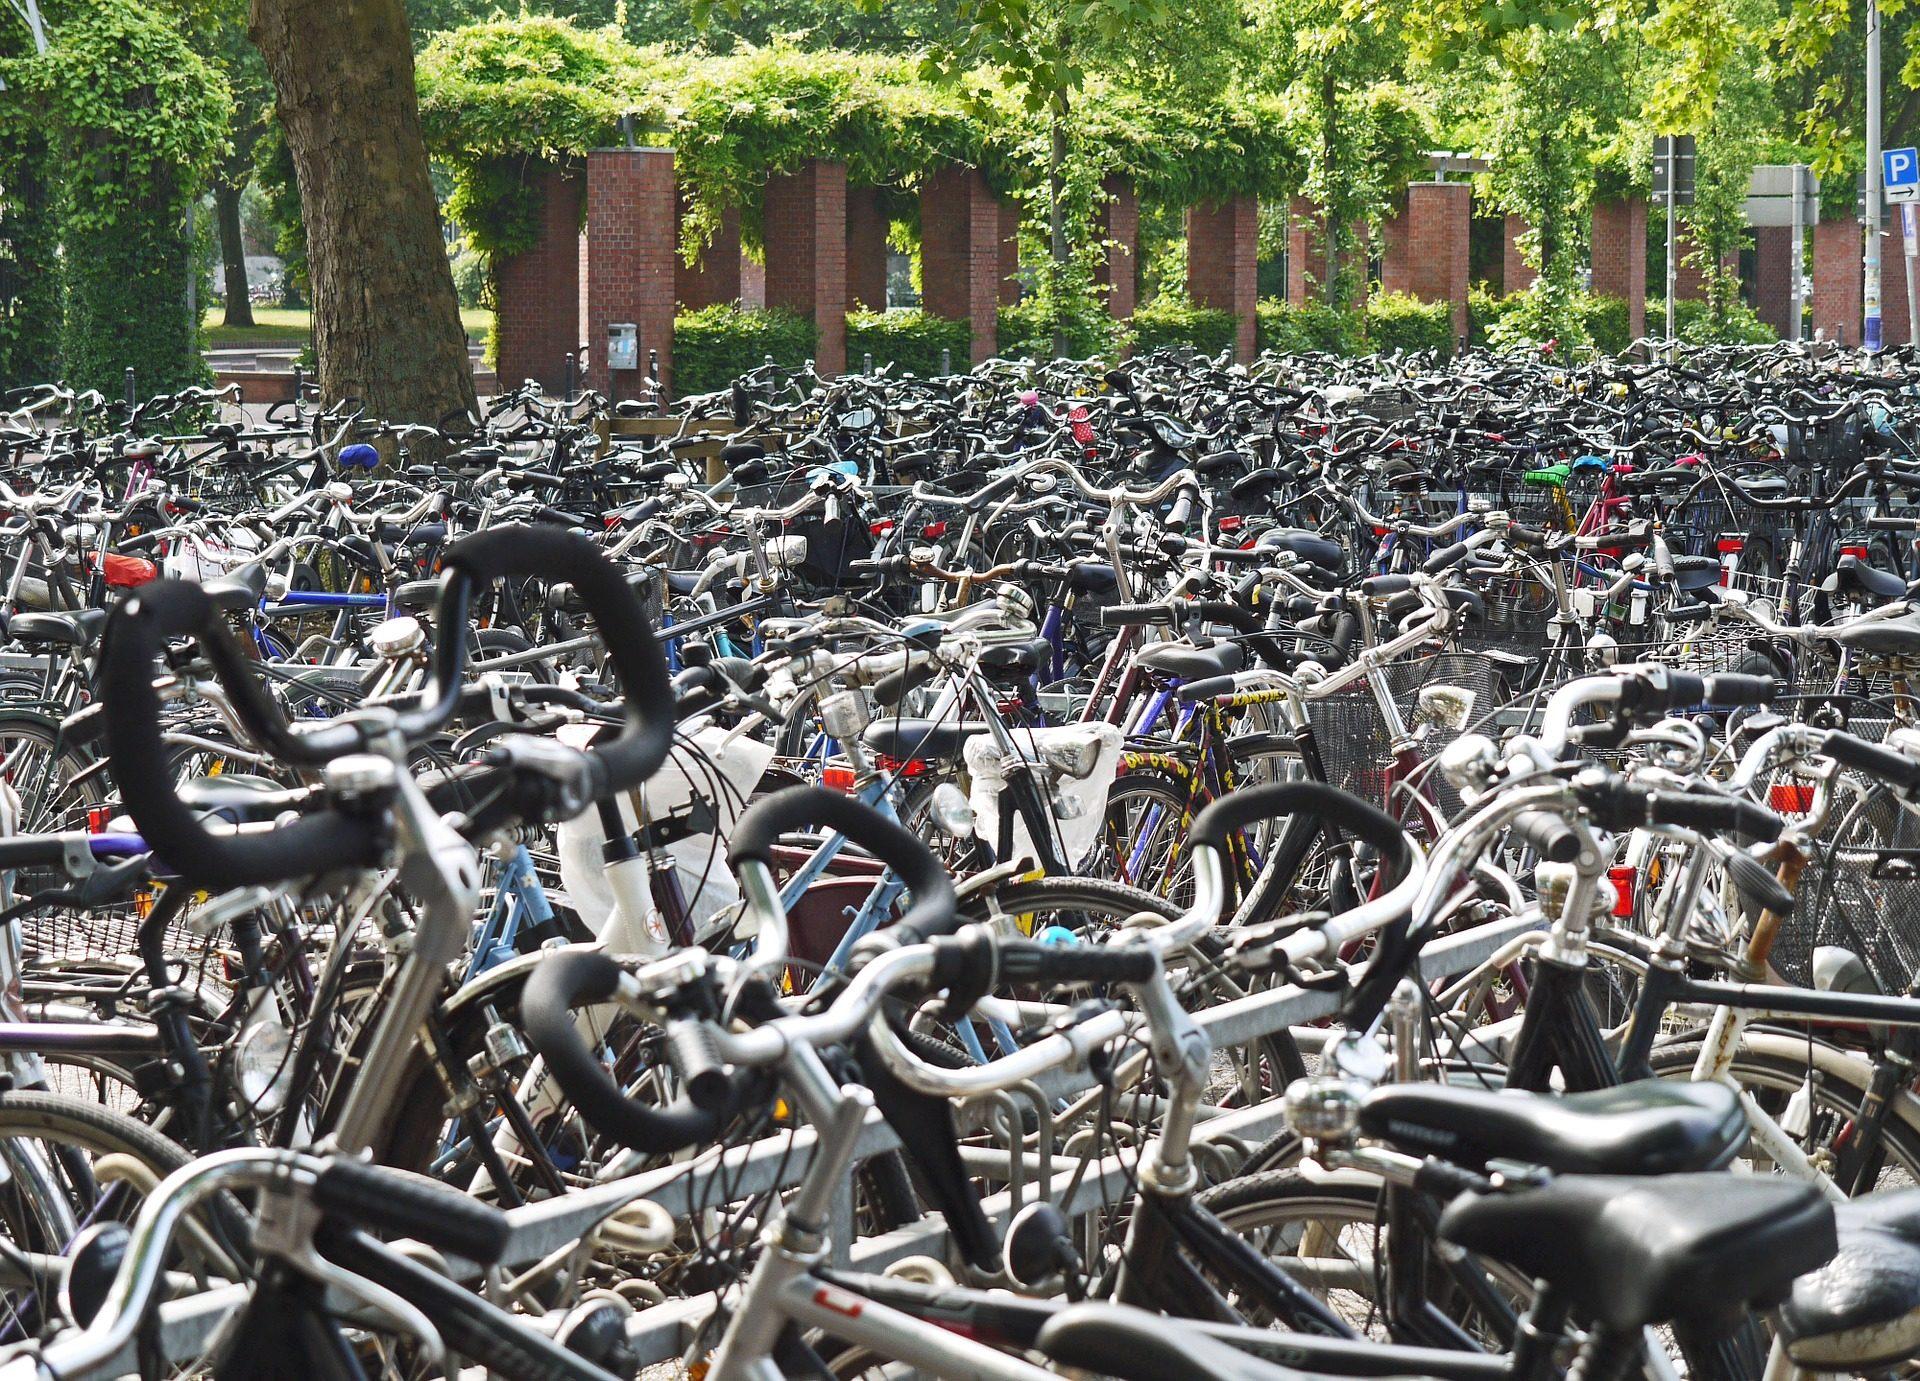 自転車, aparcamiento, 駐車場, 集積, 多様性 - HD の壁紙 - 教授-falken.com